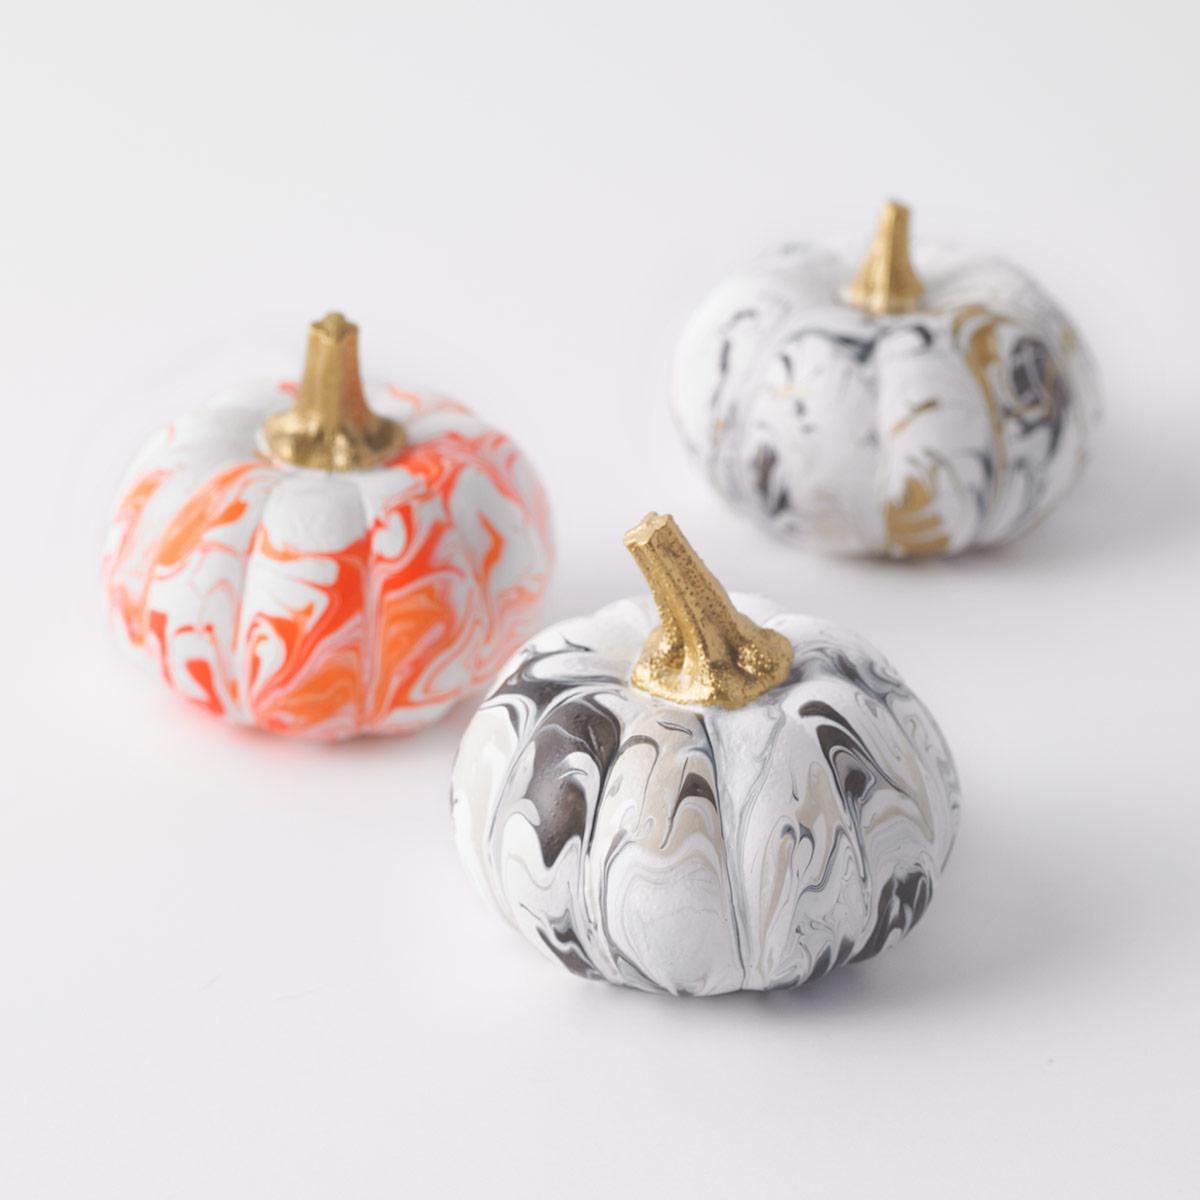 Mini Poured Pumpkins